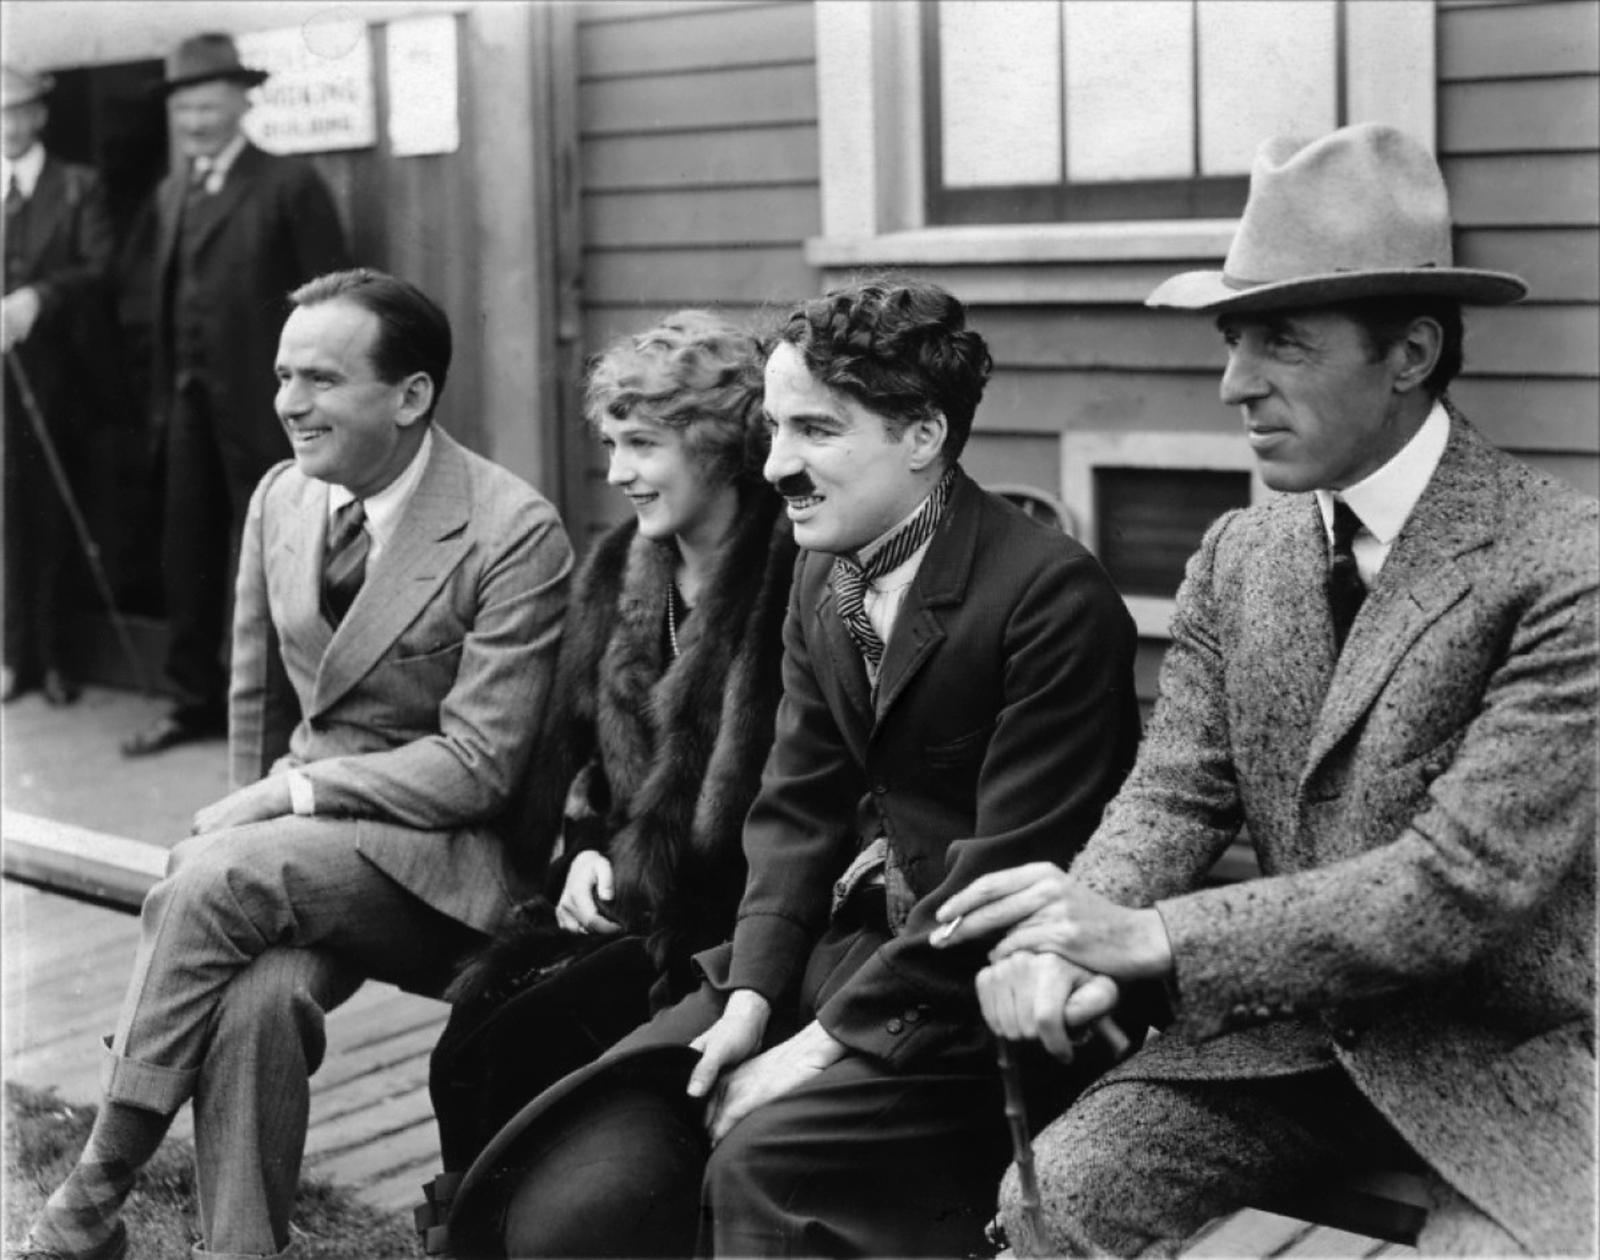 (L to R) Douglas Fairbanks, Sr.,Mary Pickford,Charlie Chaplin,D.W. Griffith,